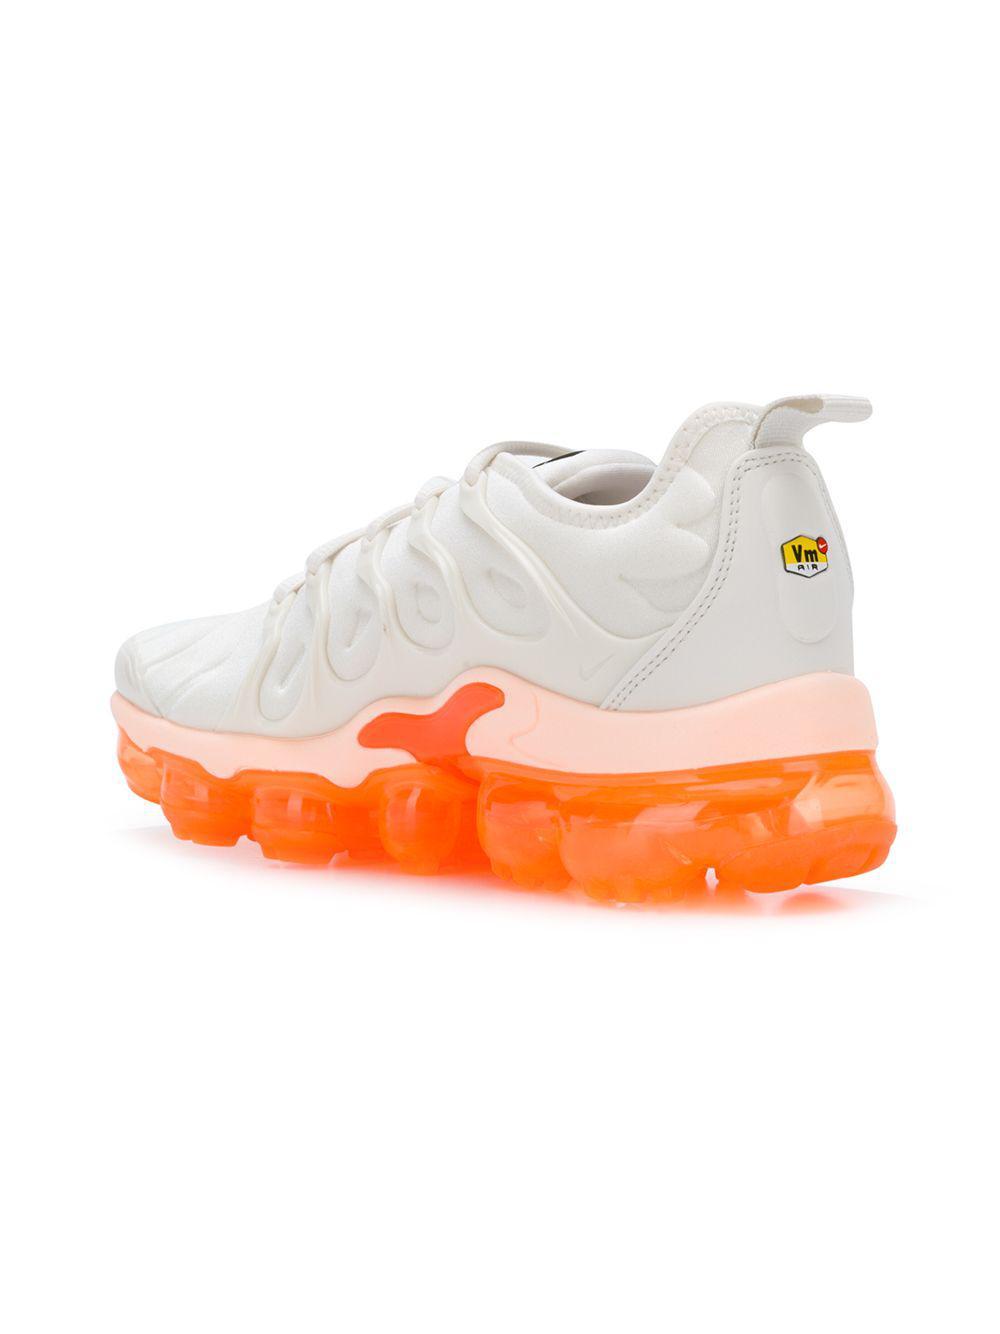 57cad1d5e8305 ... shopping nike white air vapormax plus sneakers lyst. view fullscreen  d6d64 e8f2e